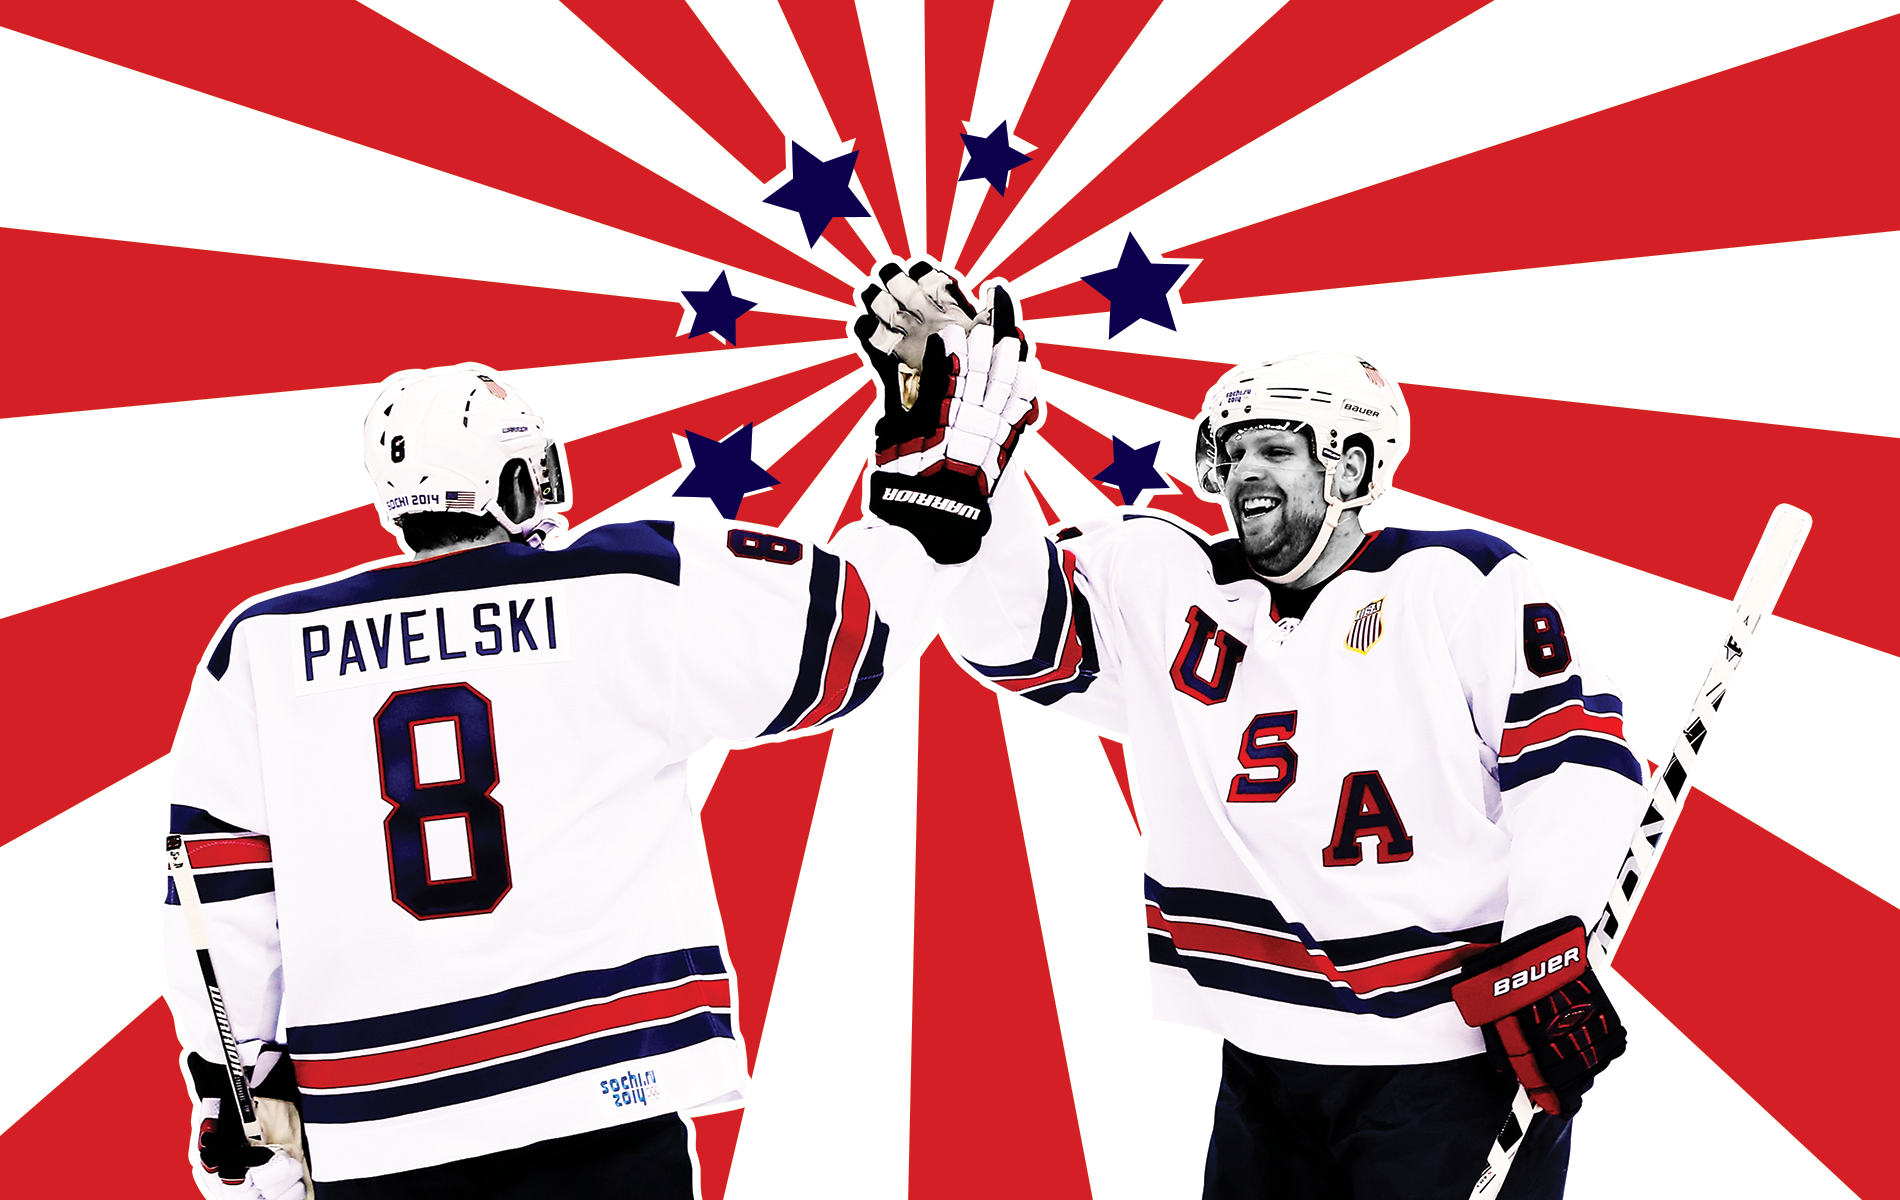 Pavelski Kessel Team Usa Wallpaper Team Usa Usa Hockey Teams